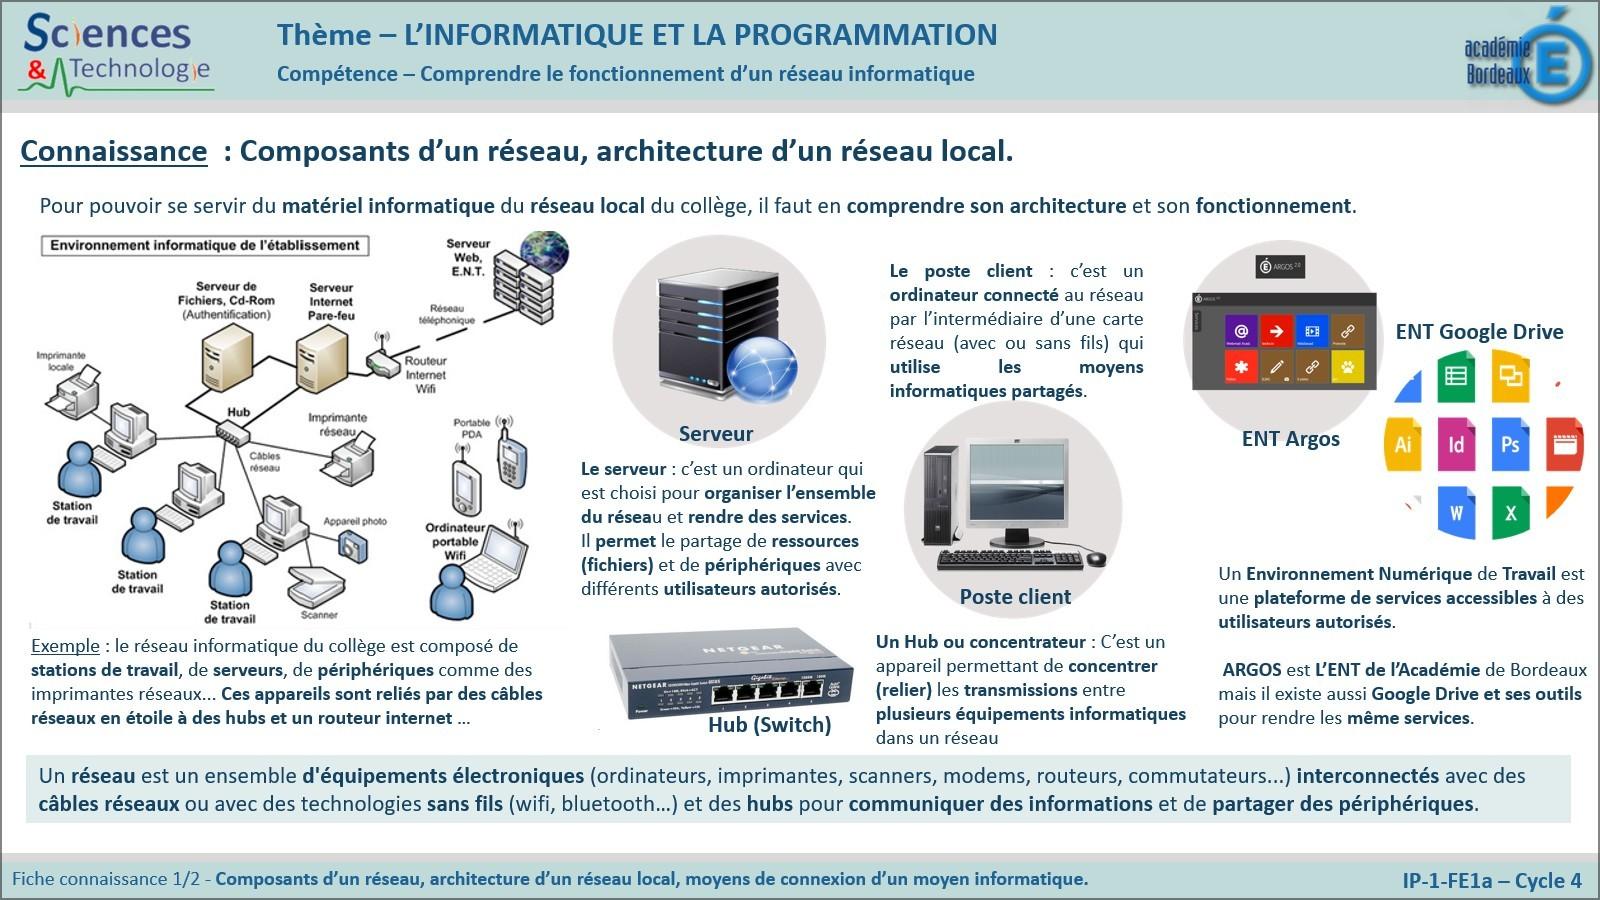 IP-1-FE1a.jpg